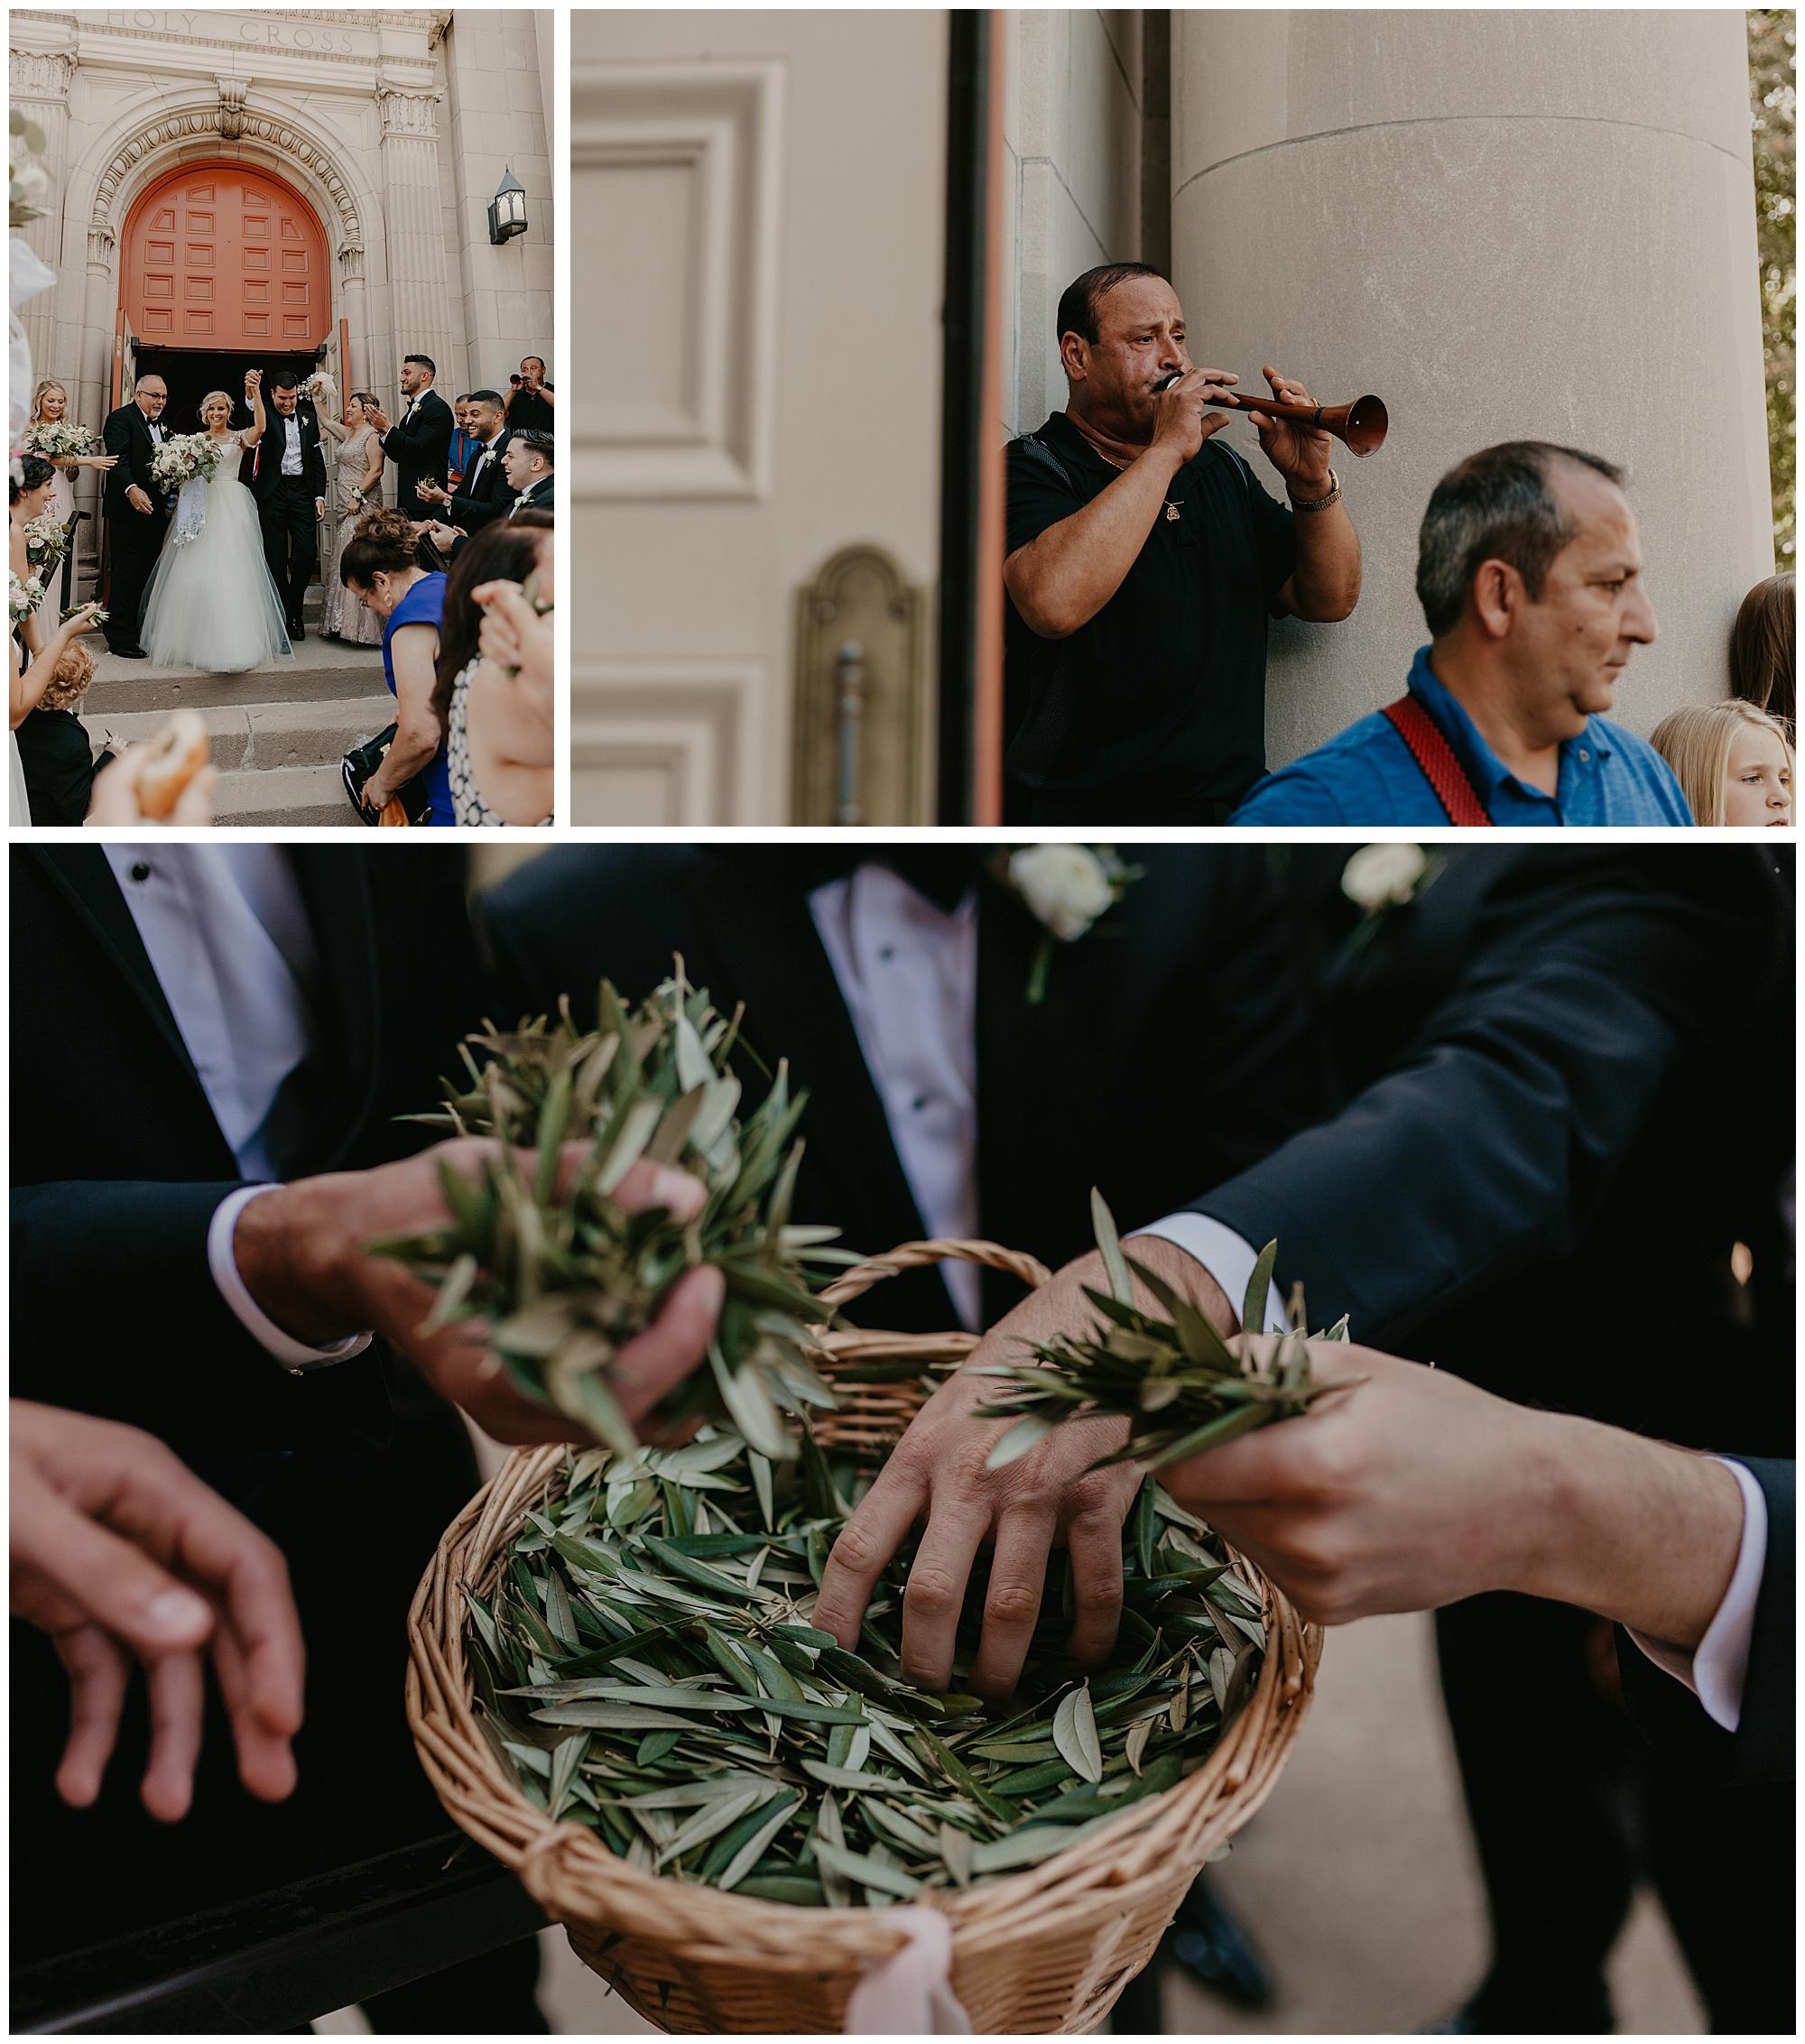 pear_tree_estate_wedding_champaign_il_wright_photographs_jj_0007.jpg